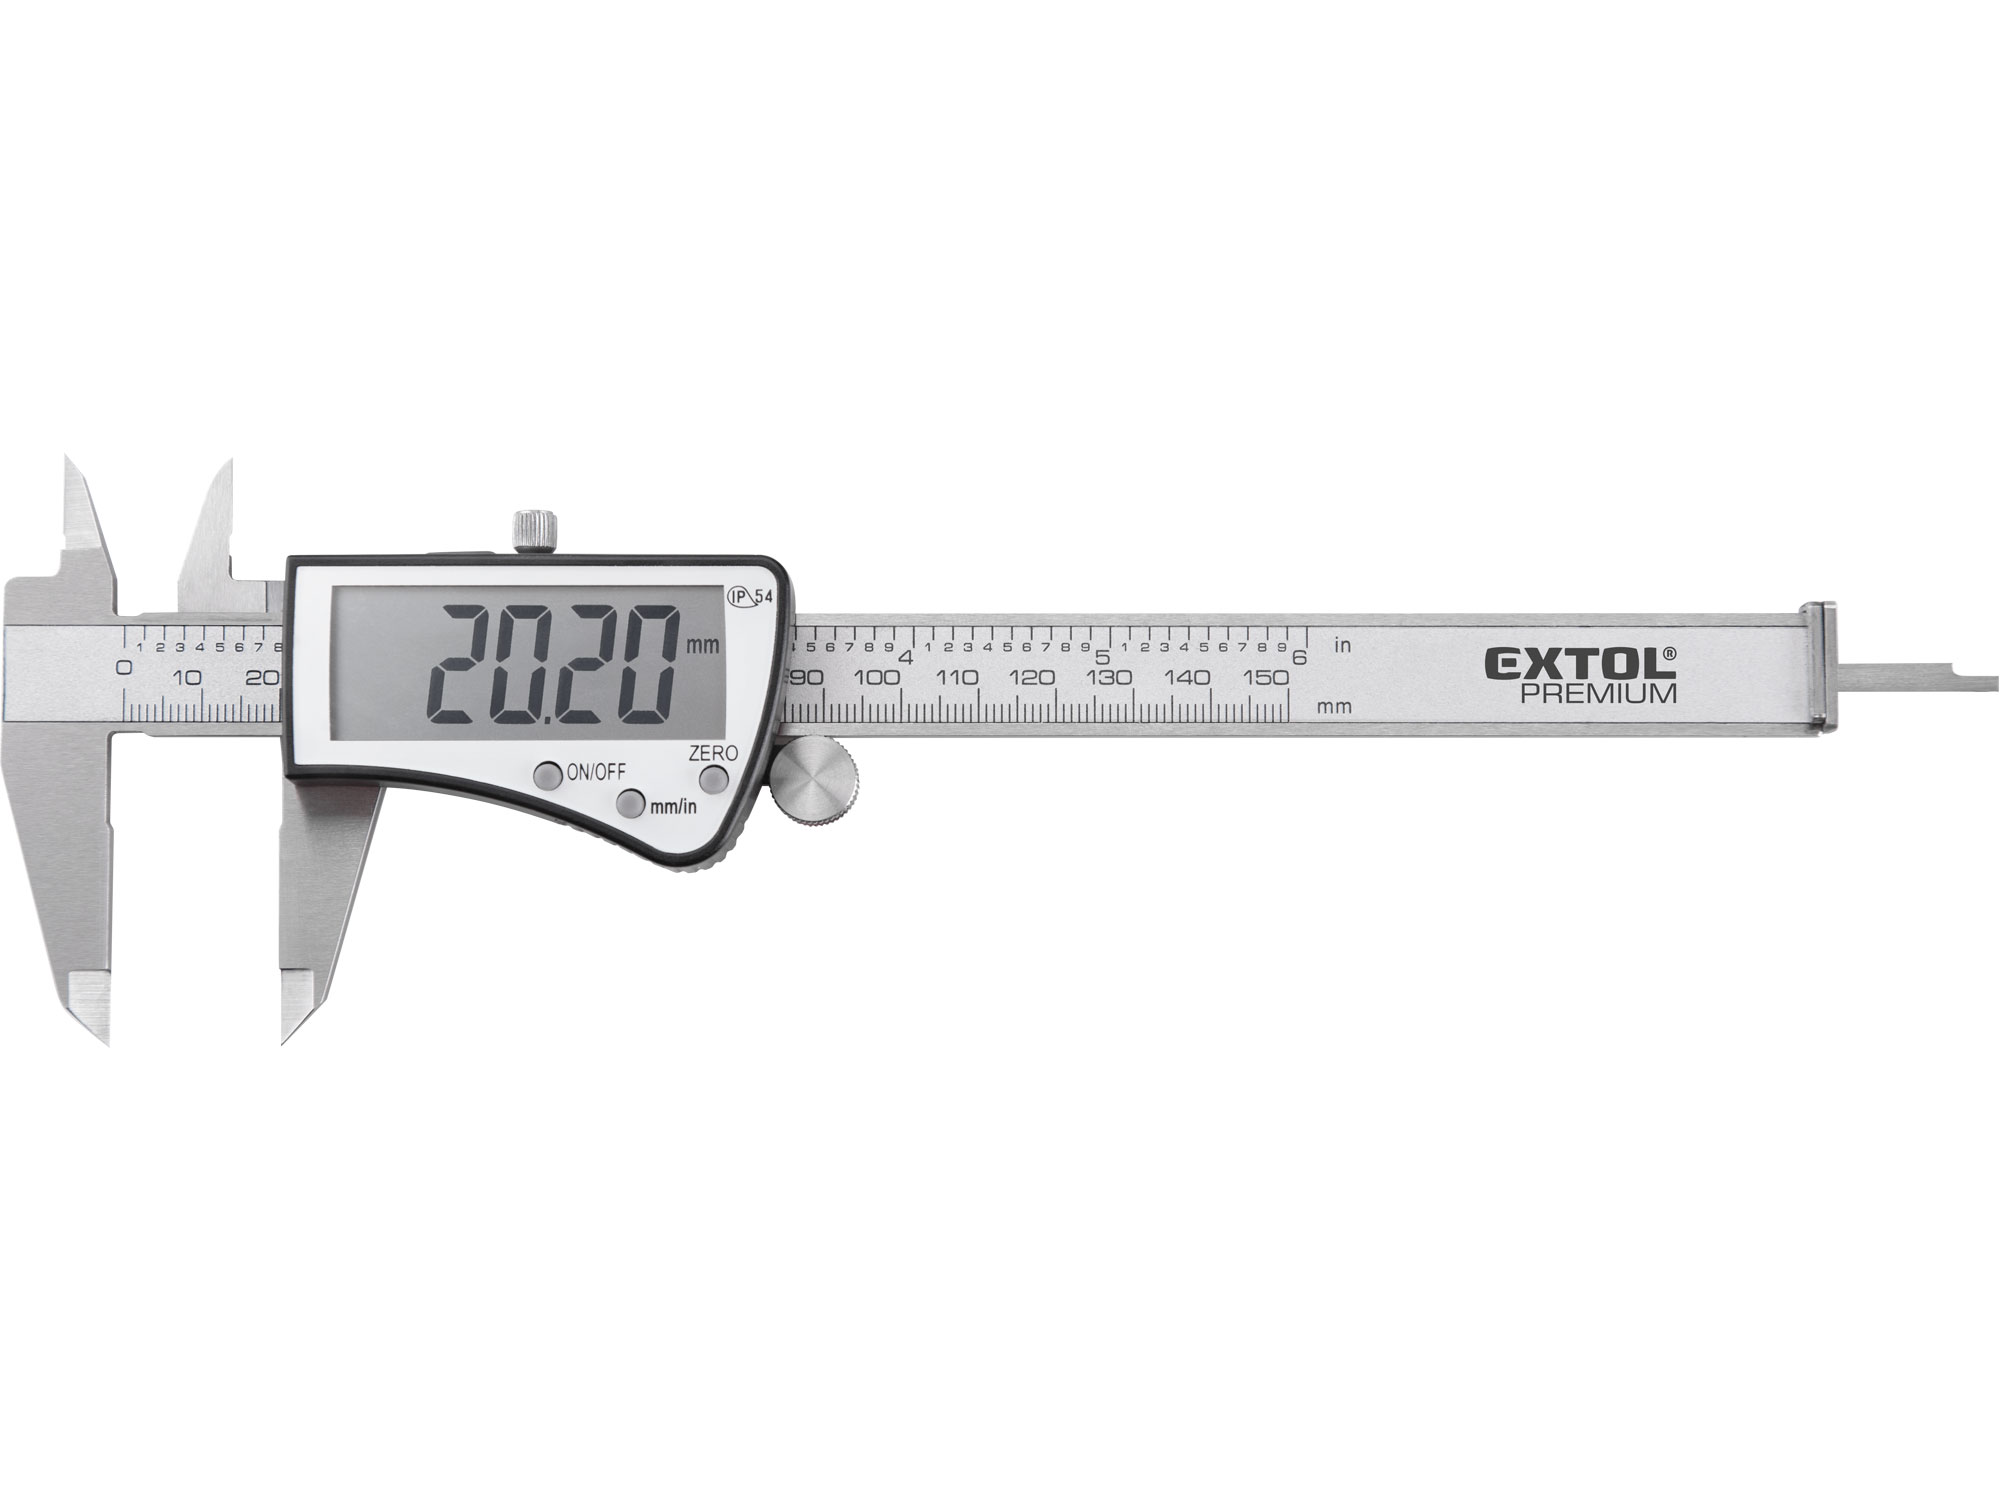 Digital Calipers, Big Screen, 0 - 150mm range